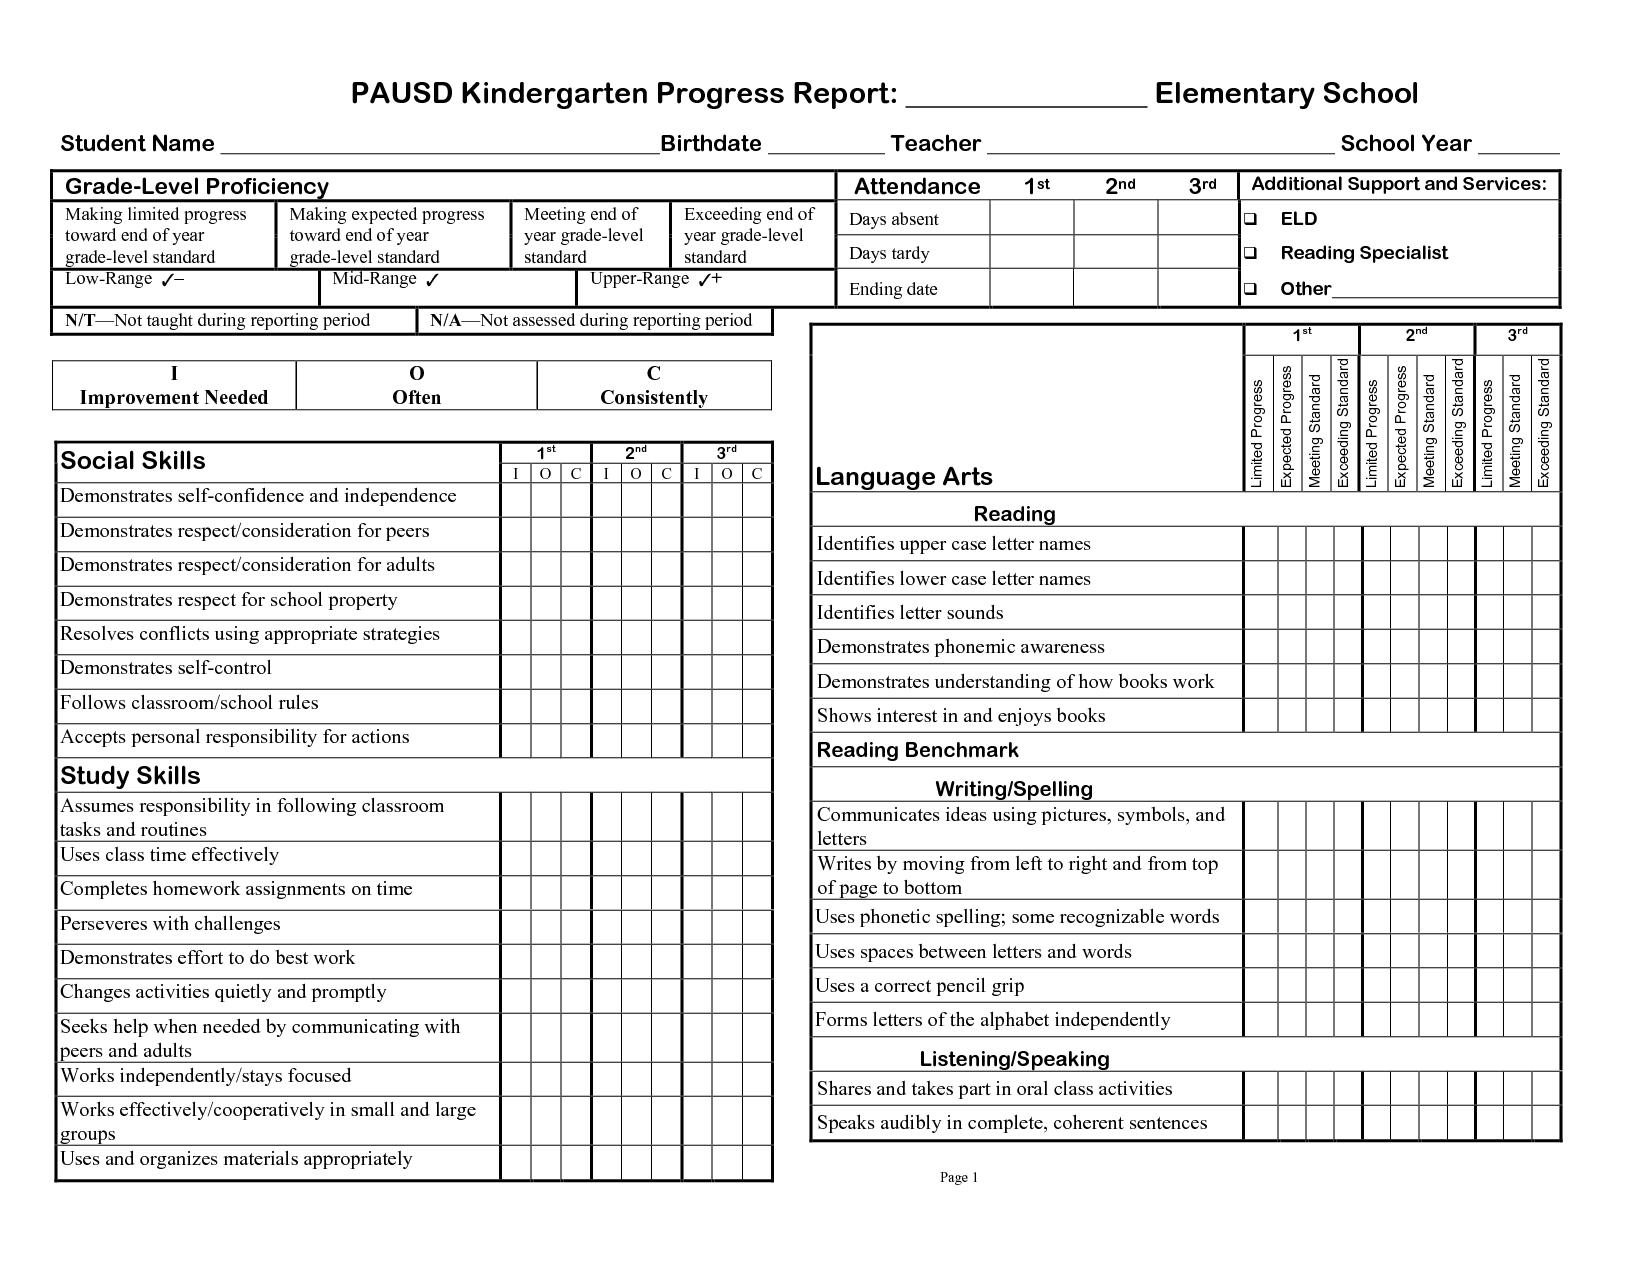 Kindergarten Social Skills Progress Report Blank Templates Intended For School Progress Report Template